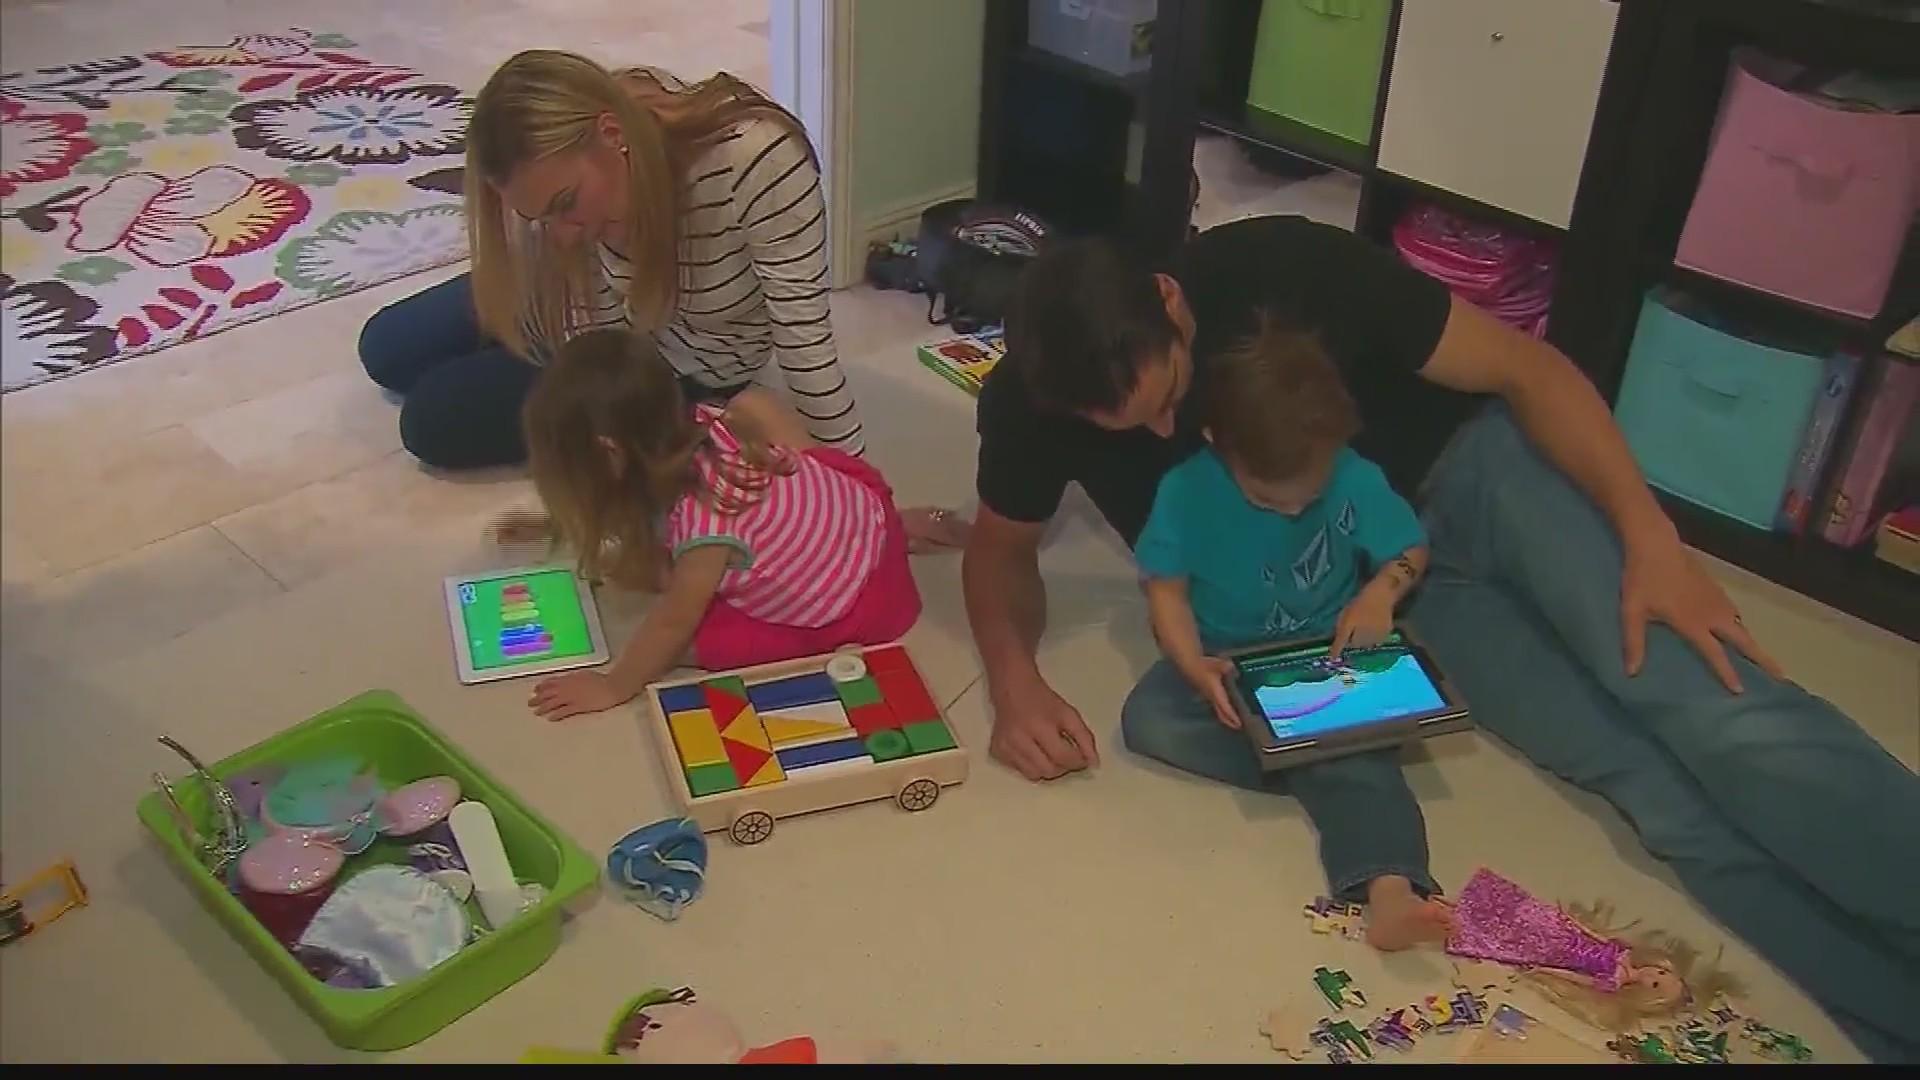 Tech_TV_screen_guidelines_for_children_0_20190425225402